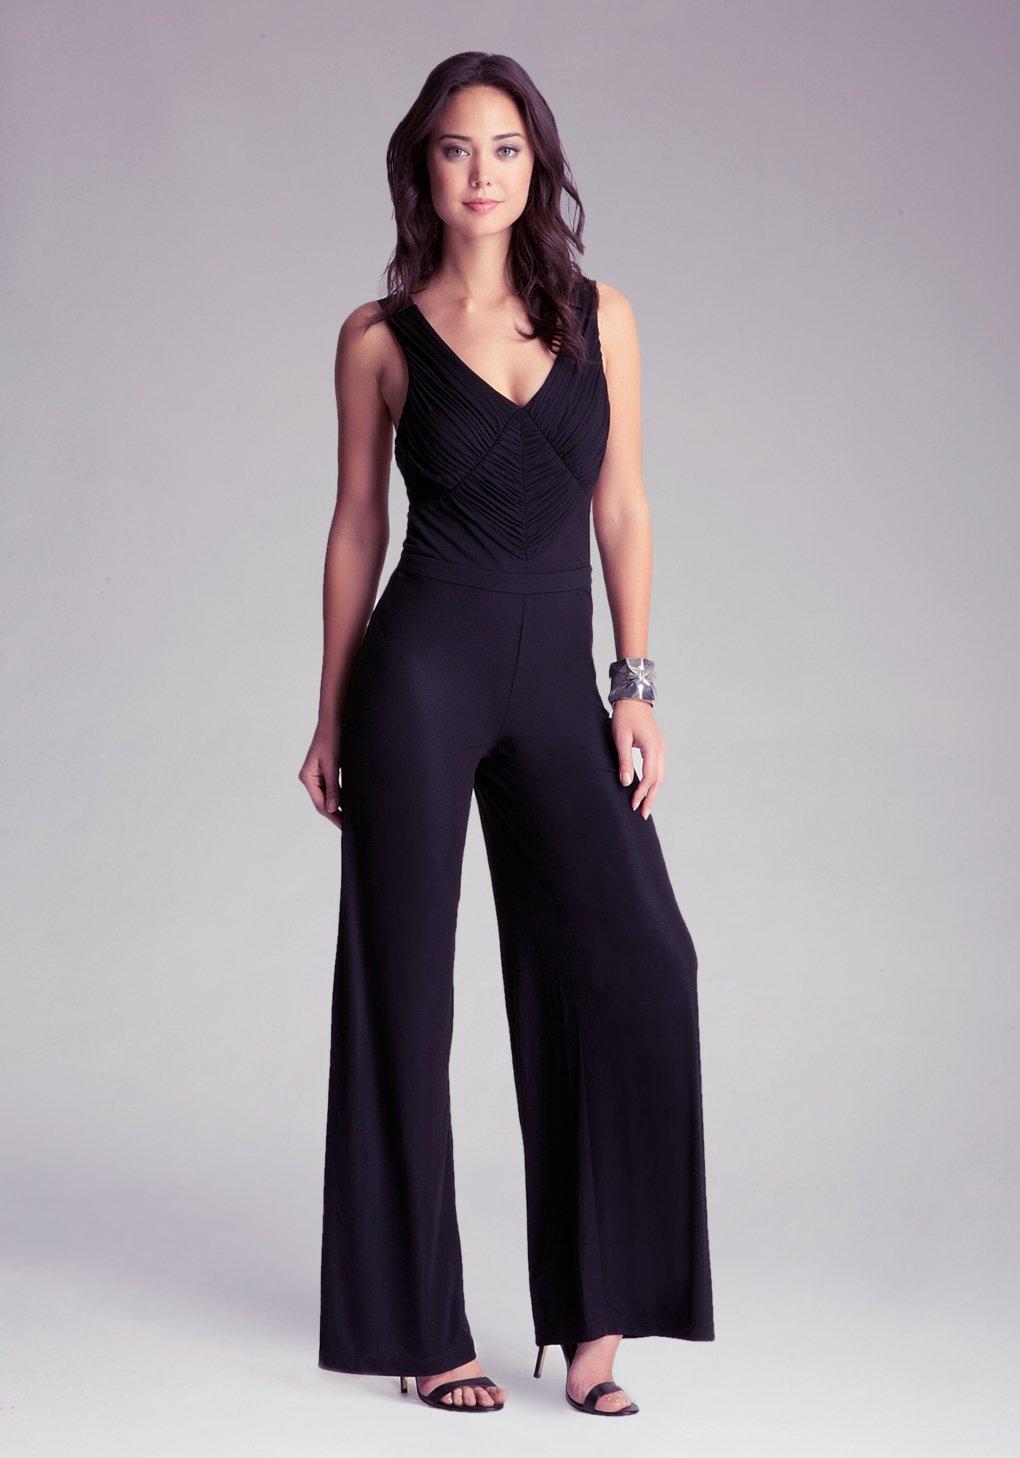 Creative New Look Petite  New Look Petite Jumpsuit At ASOS